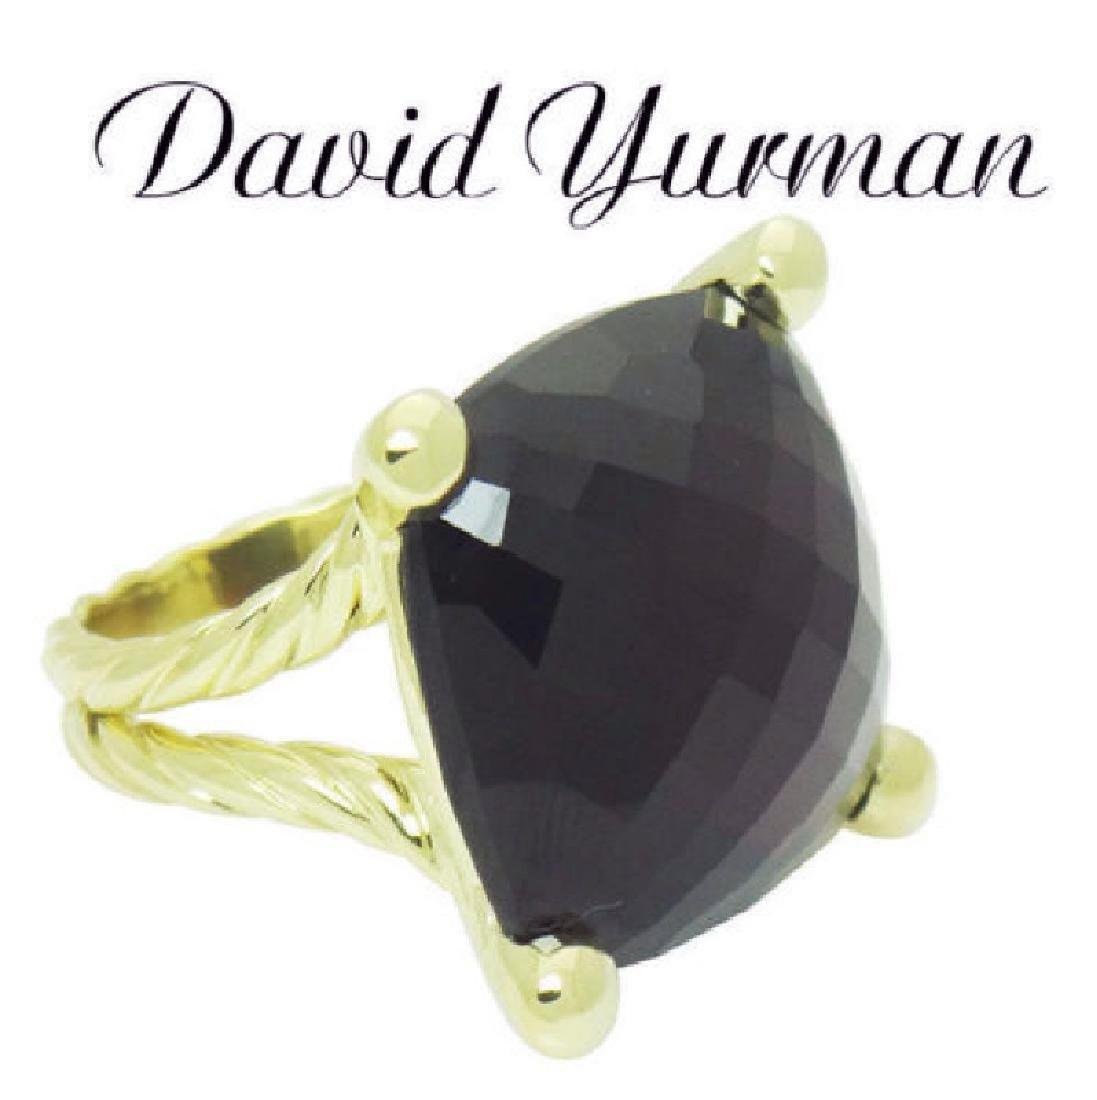 David Yurman 18k Y Gold Cushion Faceted Garnet Ring